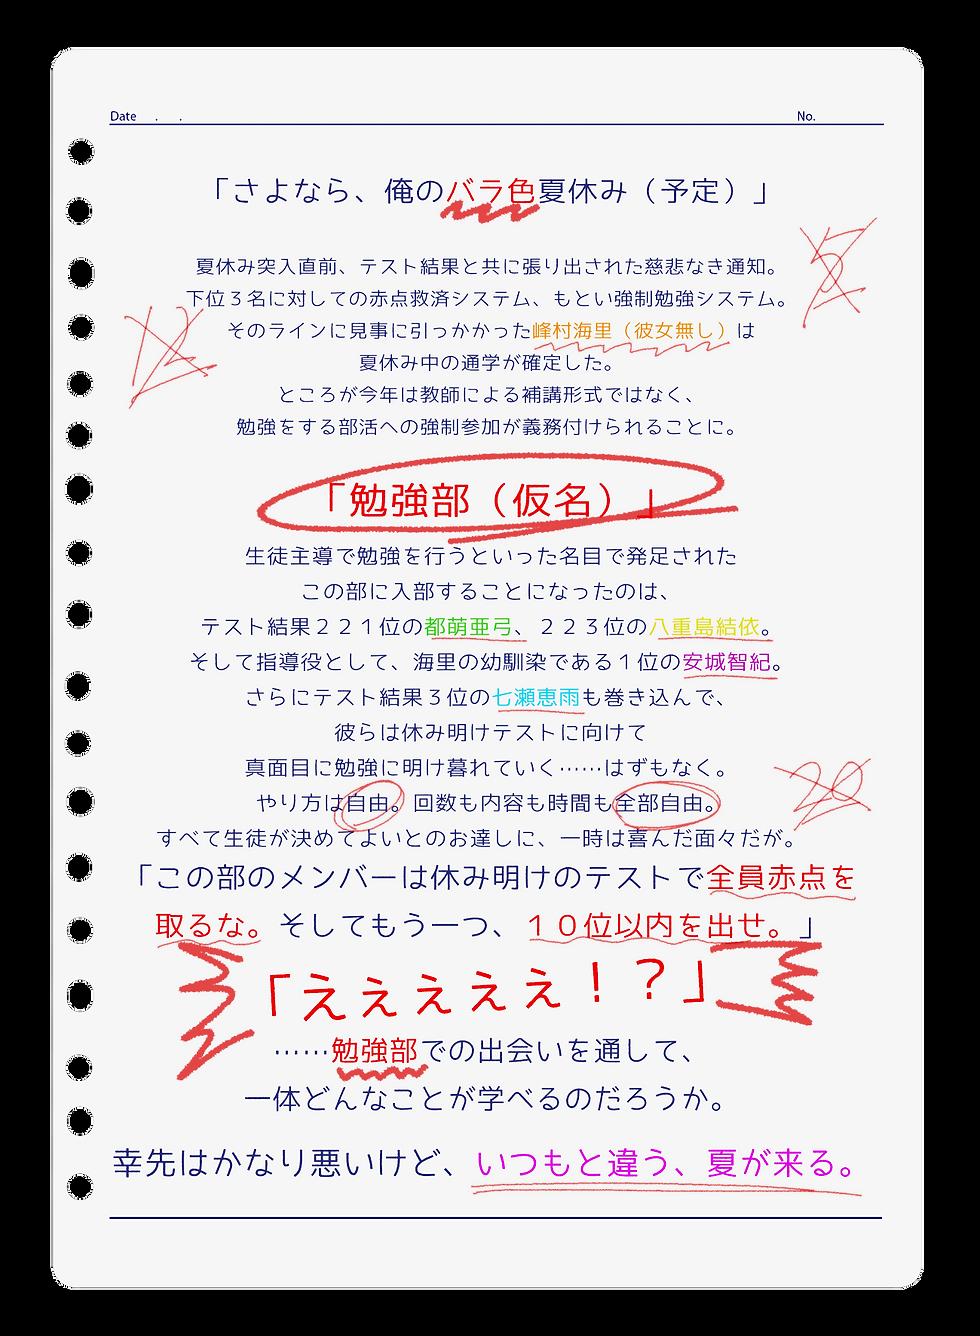 webnotebg2.png